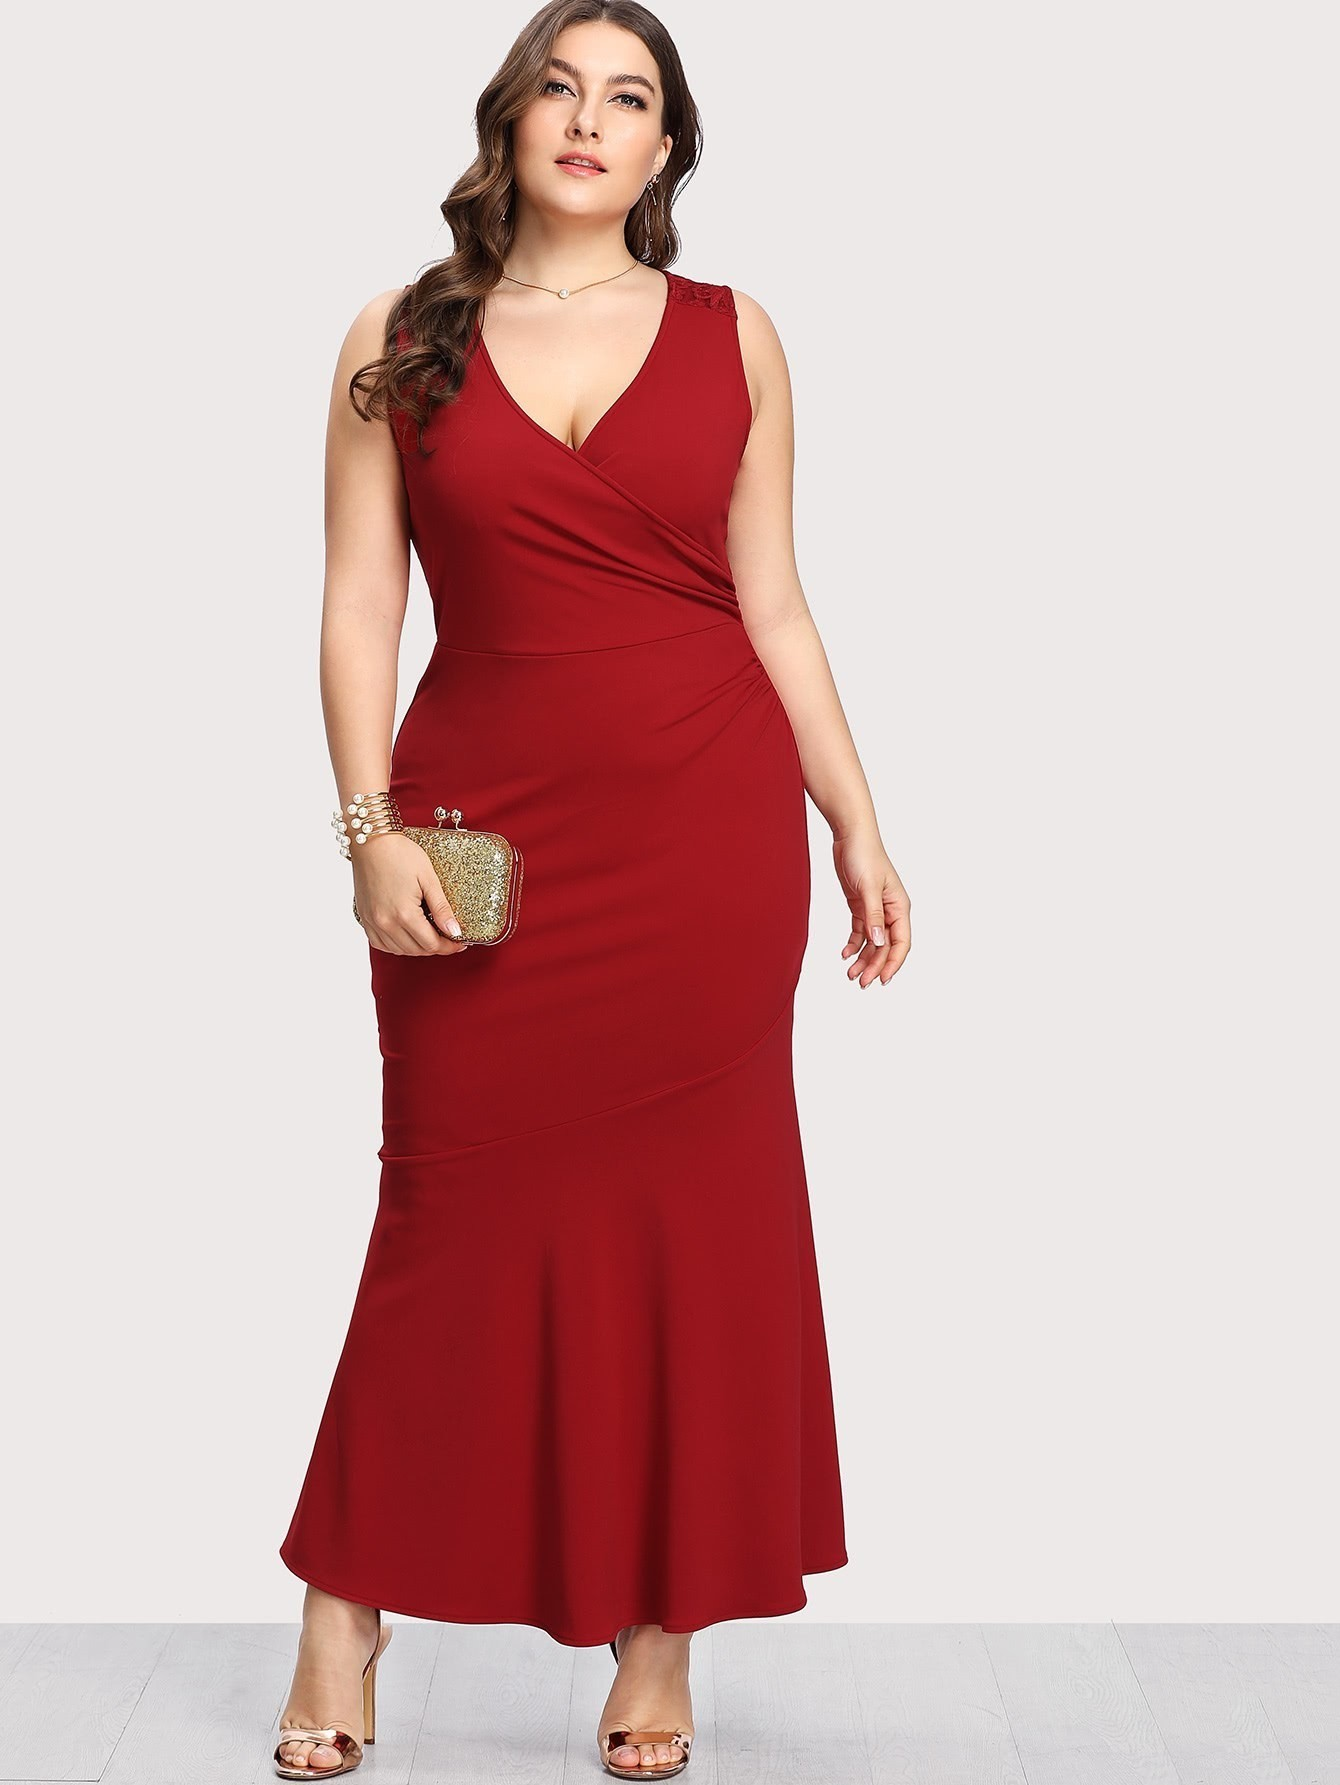 Plus Surplice Neckline Lace Overlay Fishtail Hem Dress